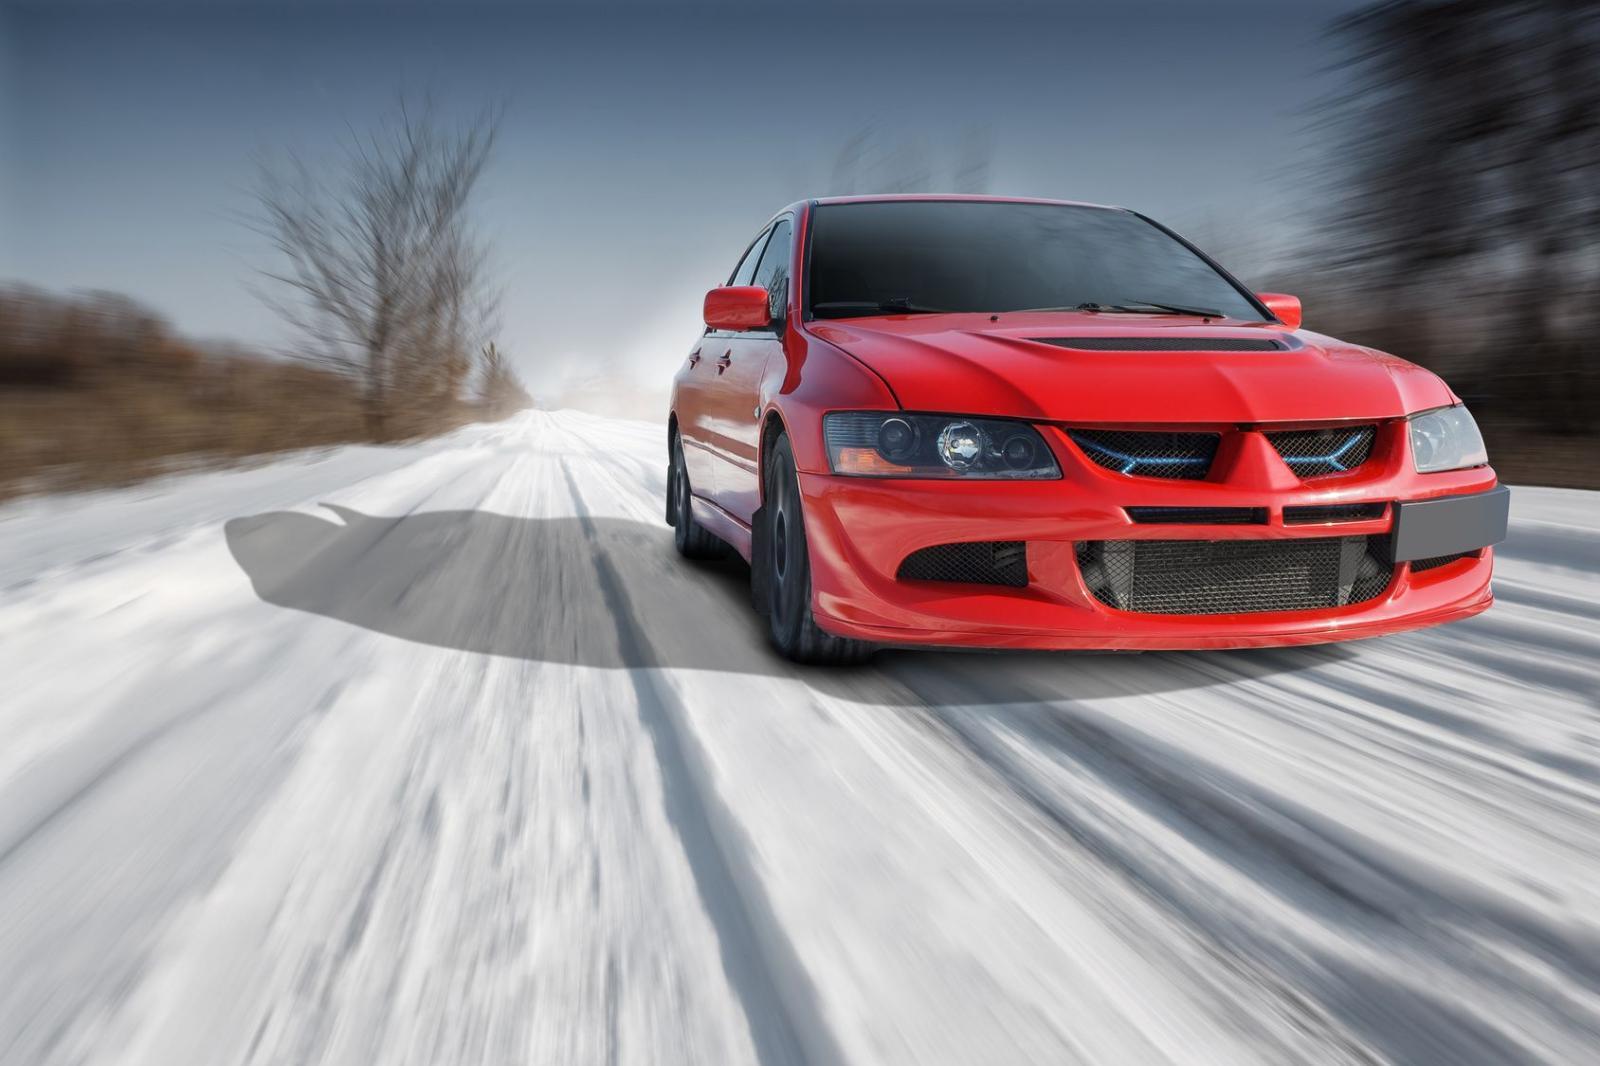 Auto-Tuning-Schnee-1-Fotolia.jpg